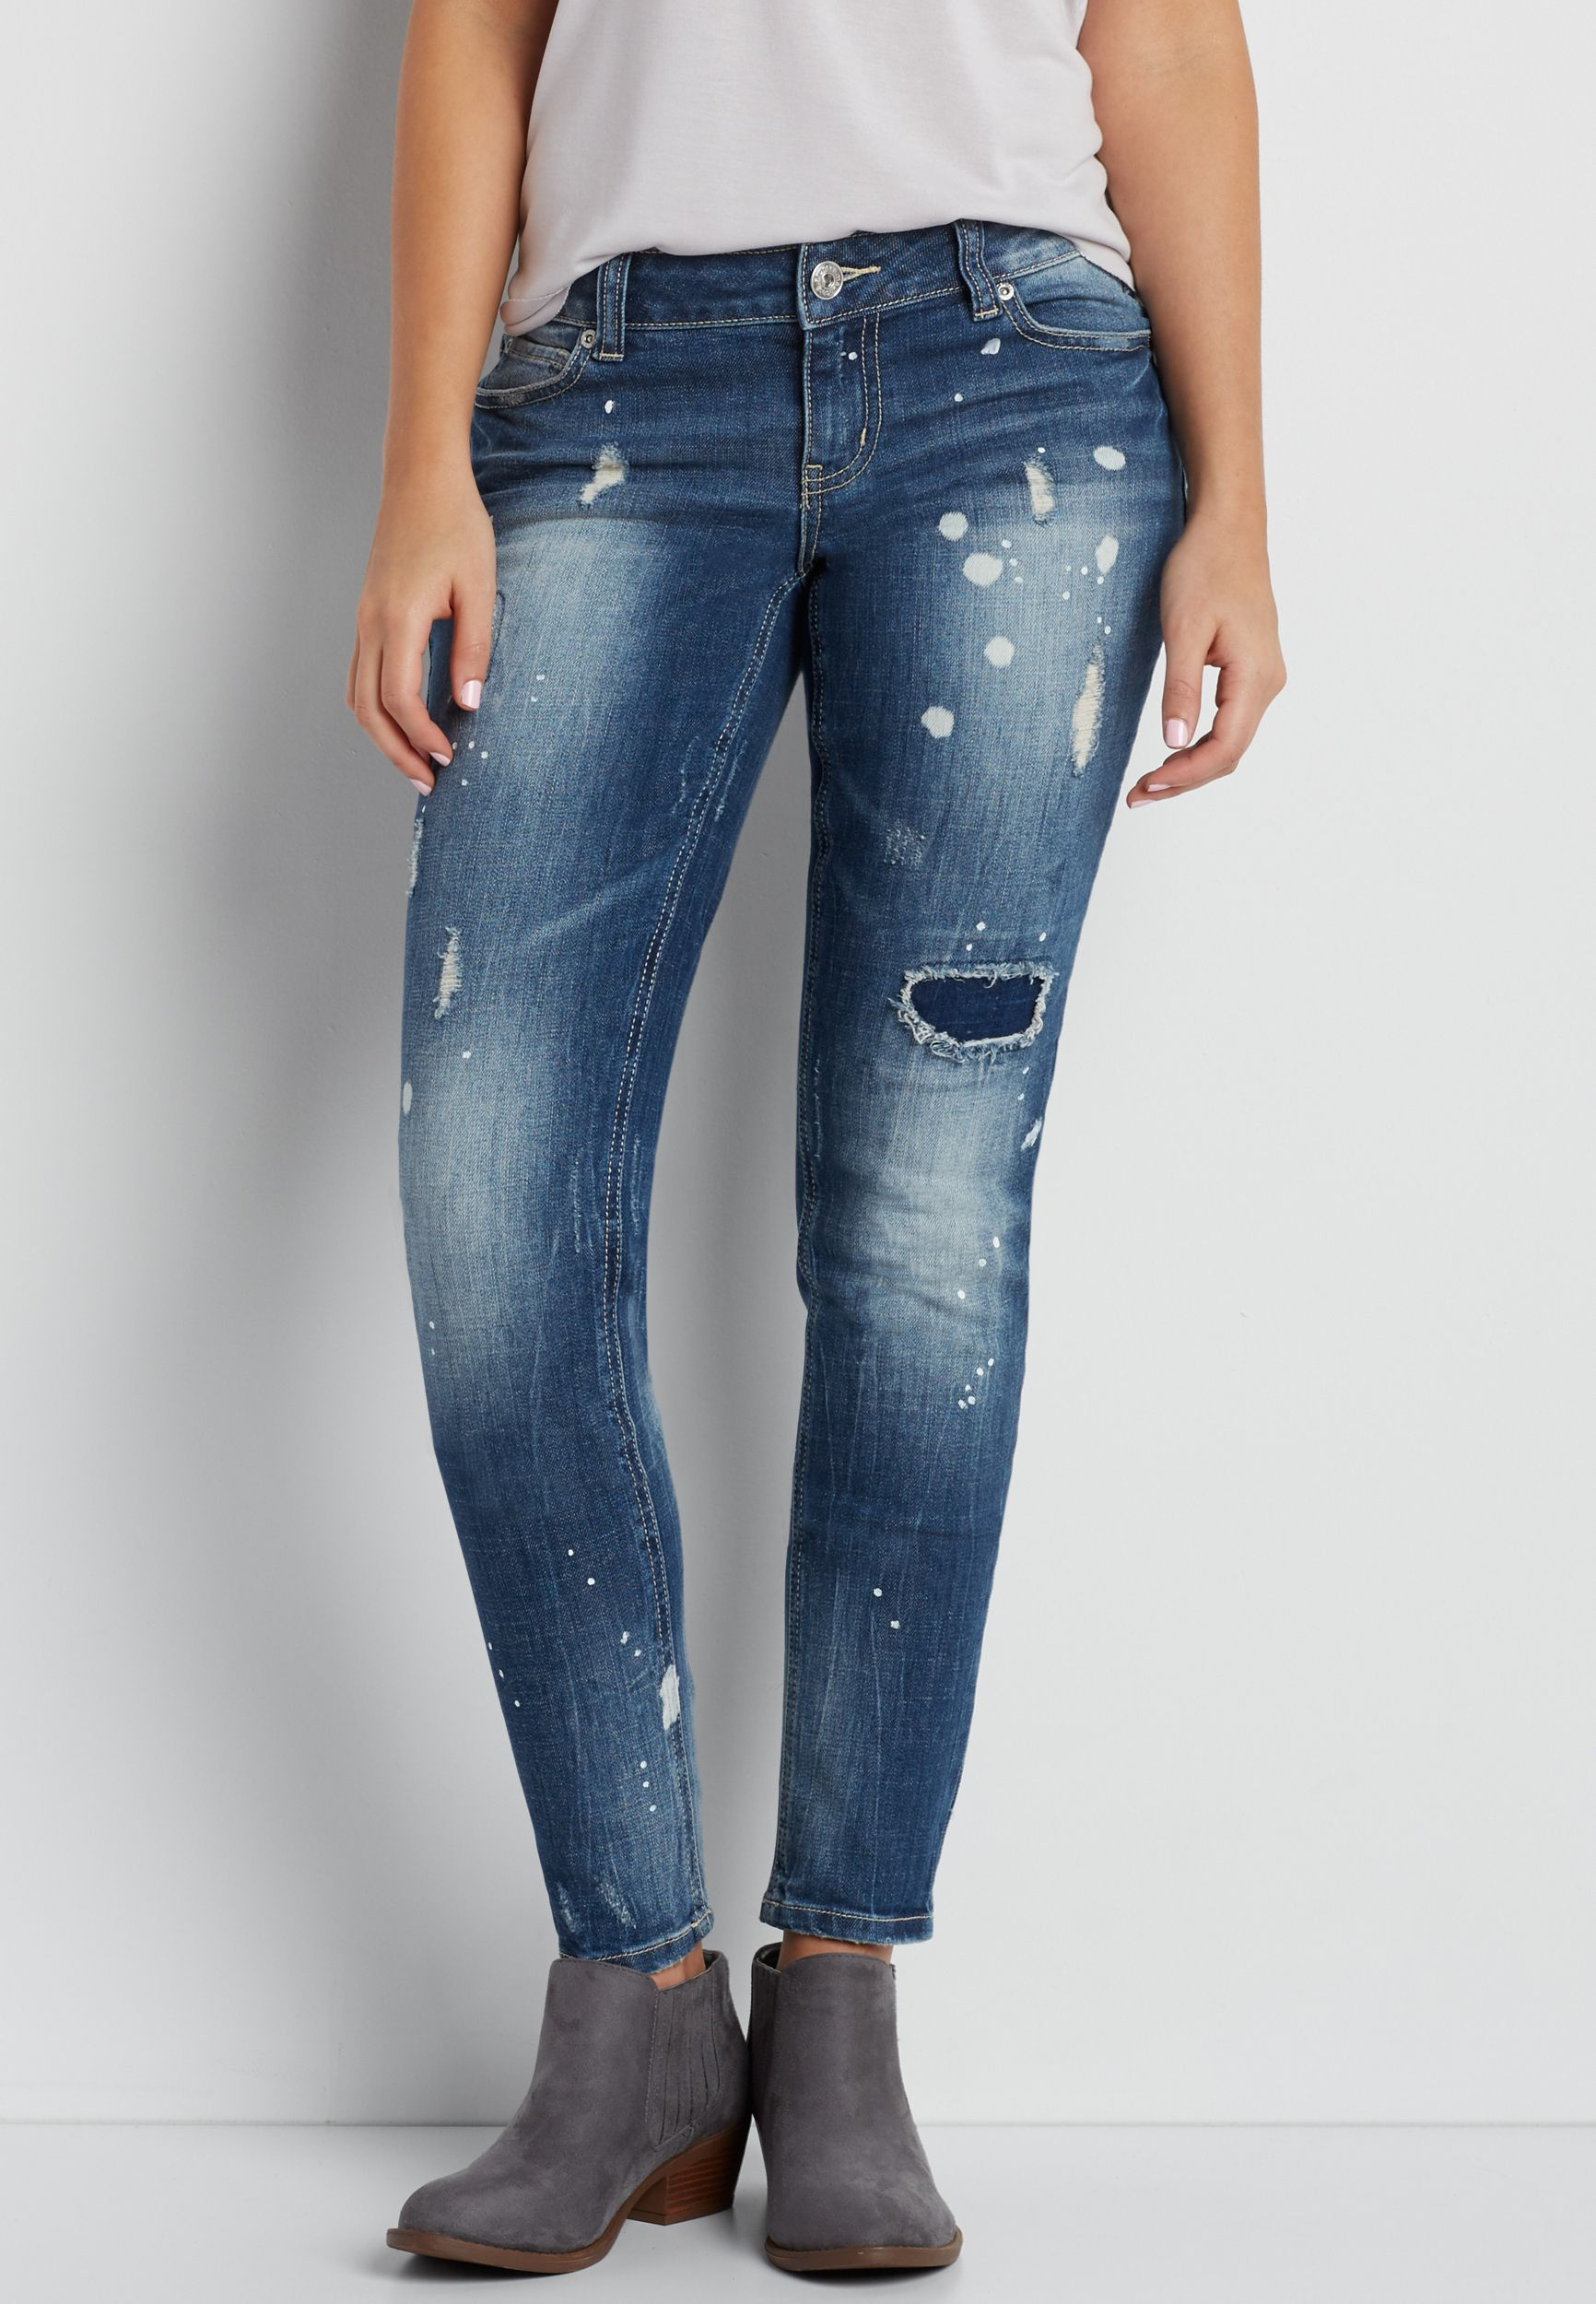 7e2f08ac12ec5 DenimFlex™ skinny jeans with destruction and paint splatter (original  price